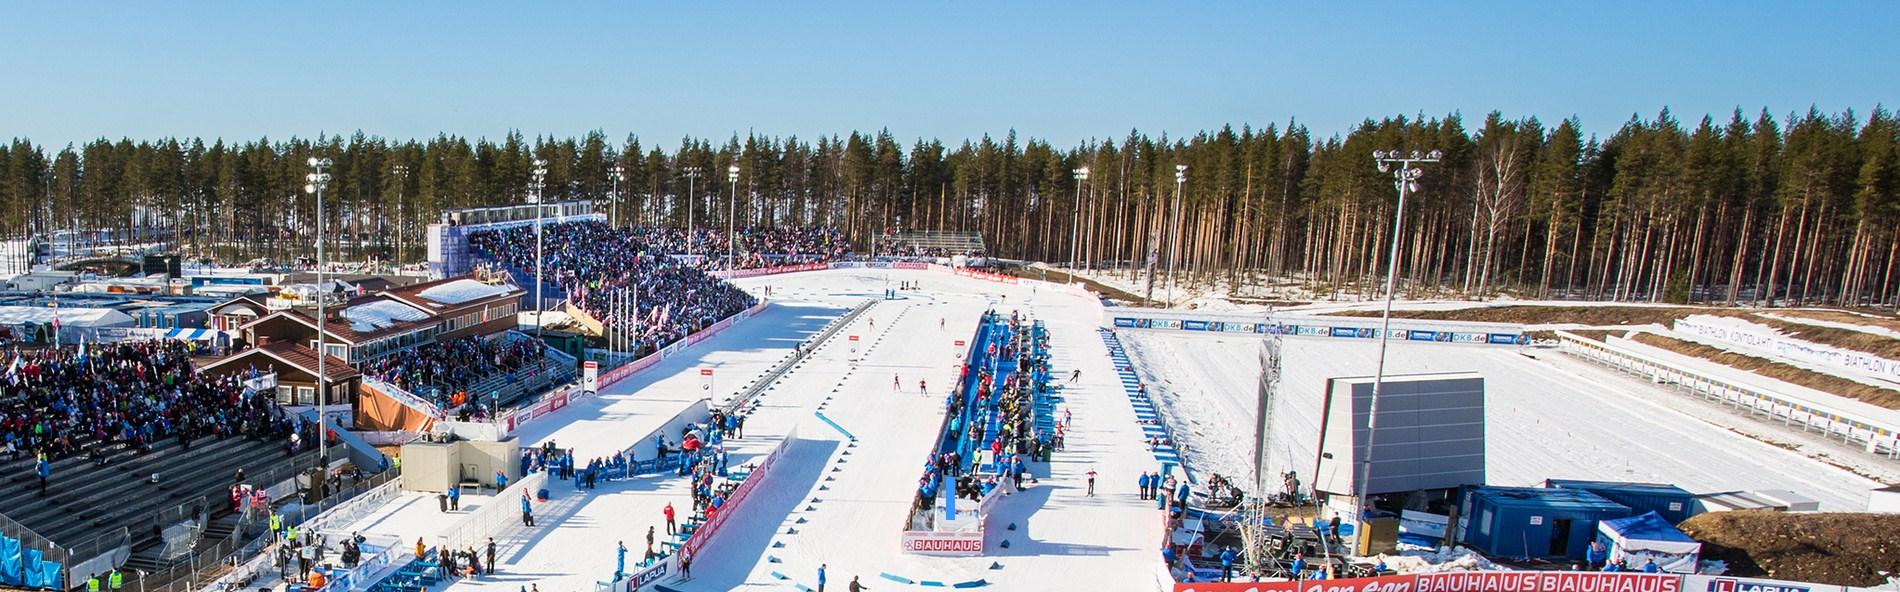 https://www.biathlon.com.ua/uploads/2020/118148.jpg